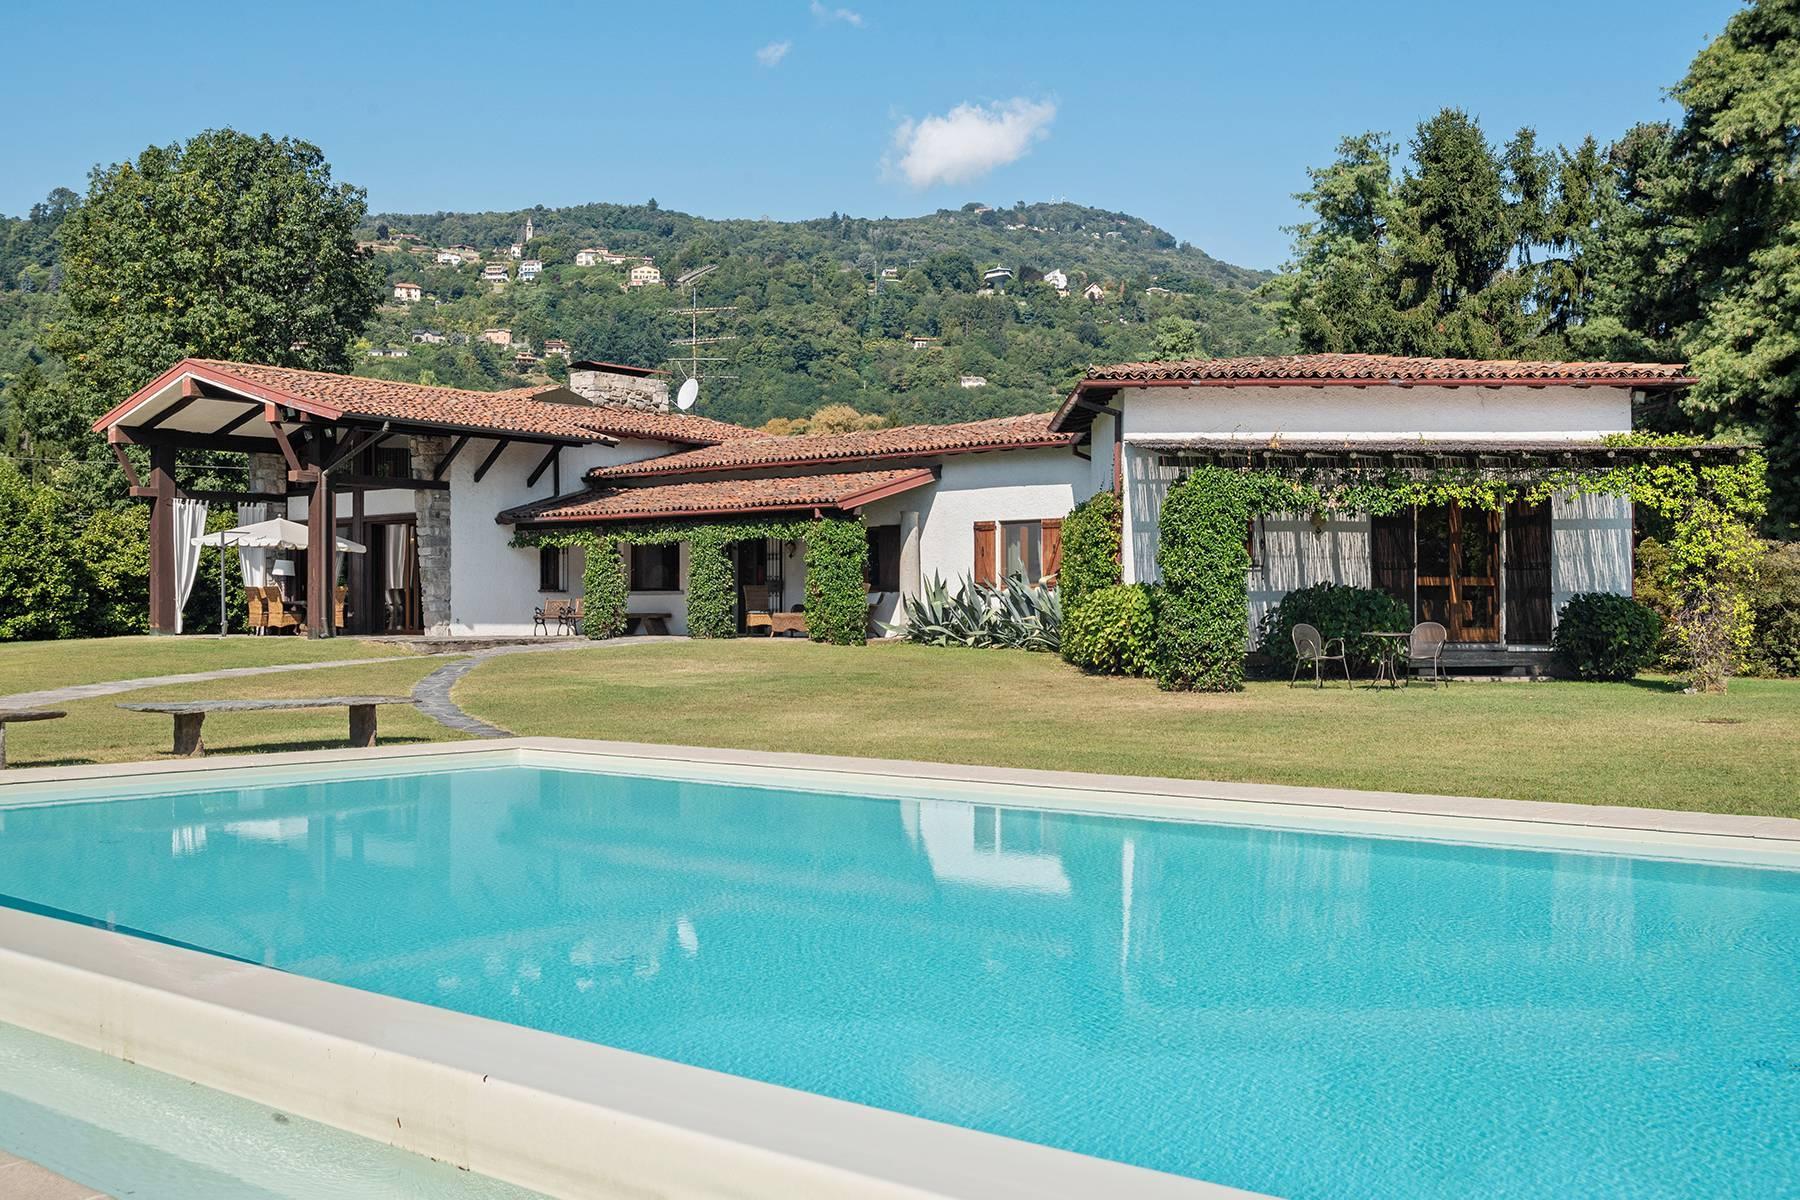 Charmante Villa in Lesa, mitten in der Natur - 14